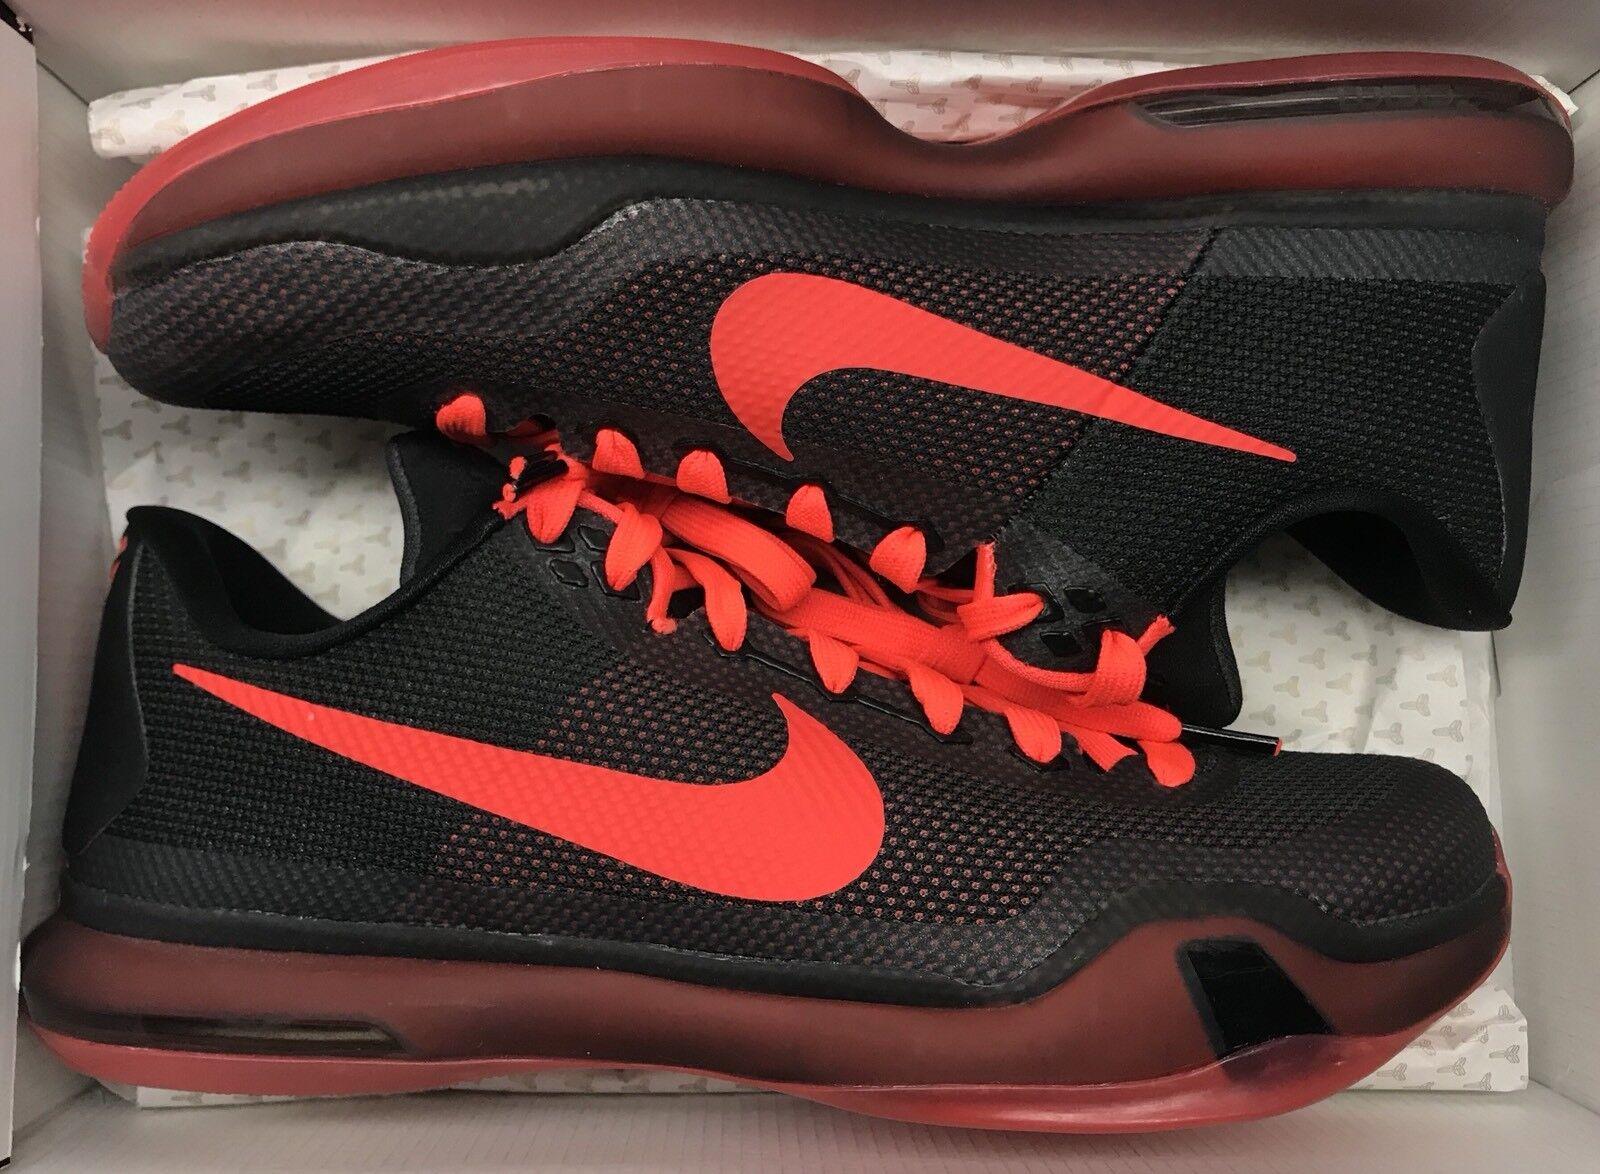 Nike Kobe X 10 Low Black Bright Crimson Anthracite Red IV V 1 I 705317-060 Sz 10